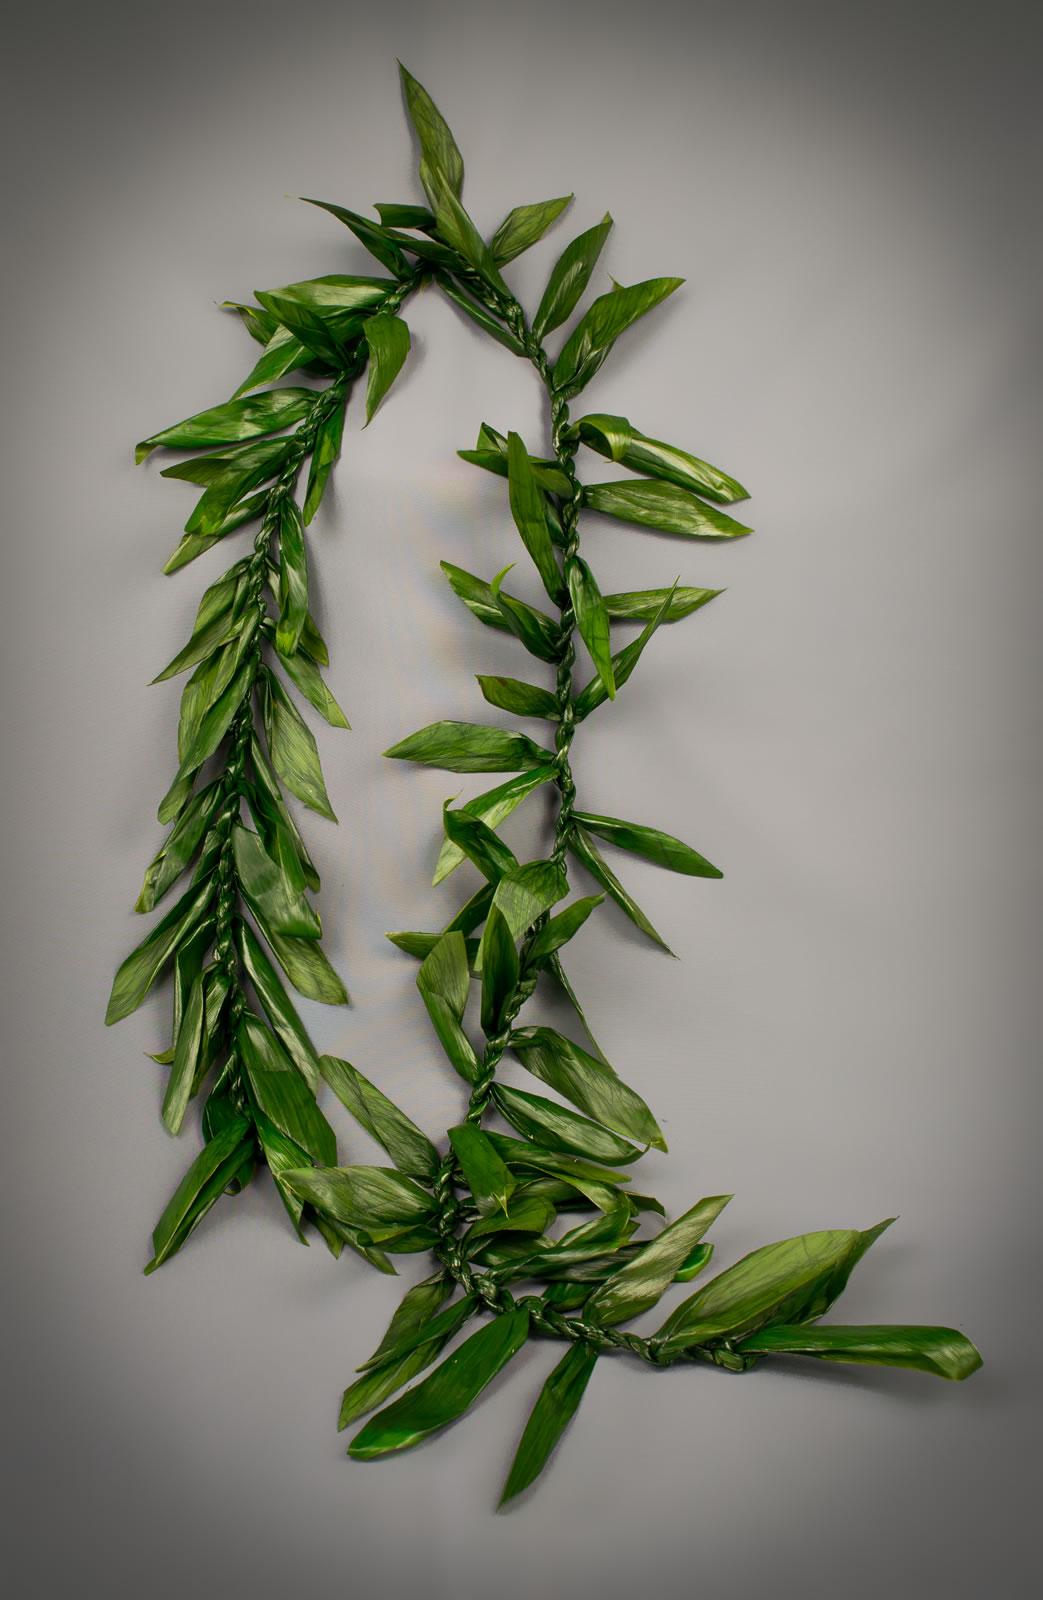 Maile ti leaf lei puna ohana tropical flowers leis home izmirmasajfo Images